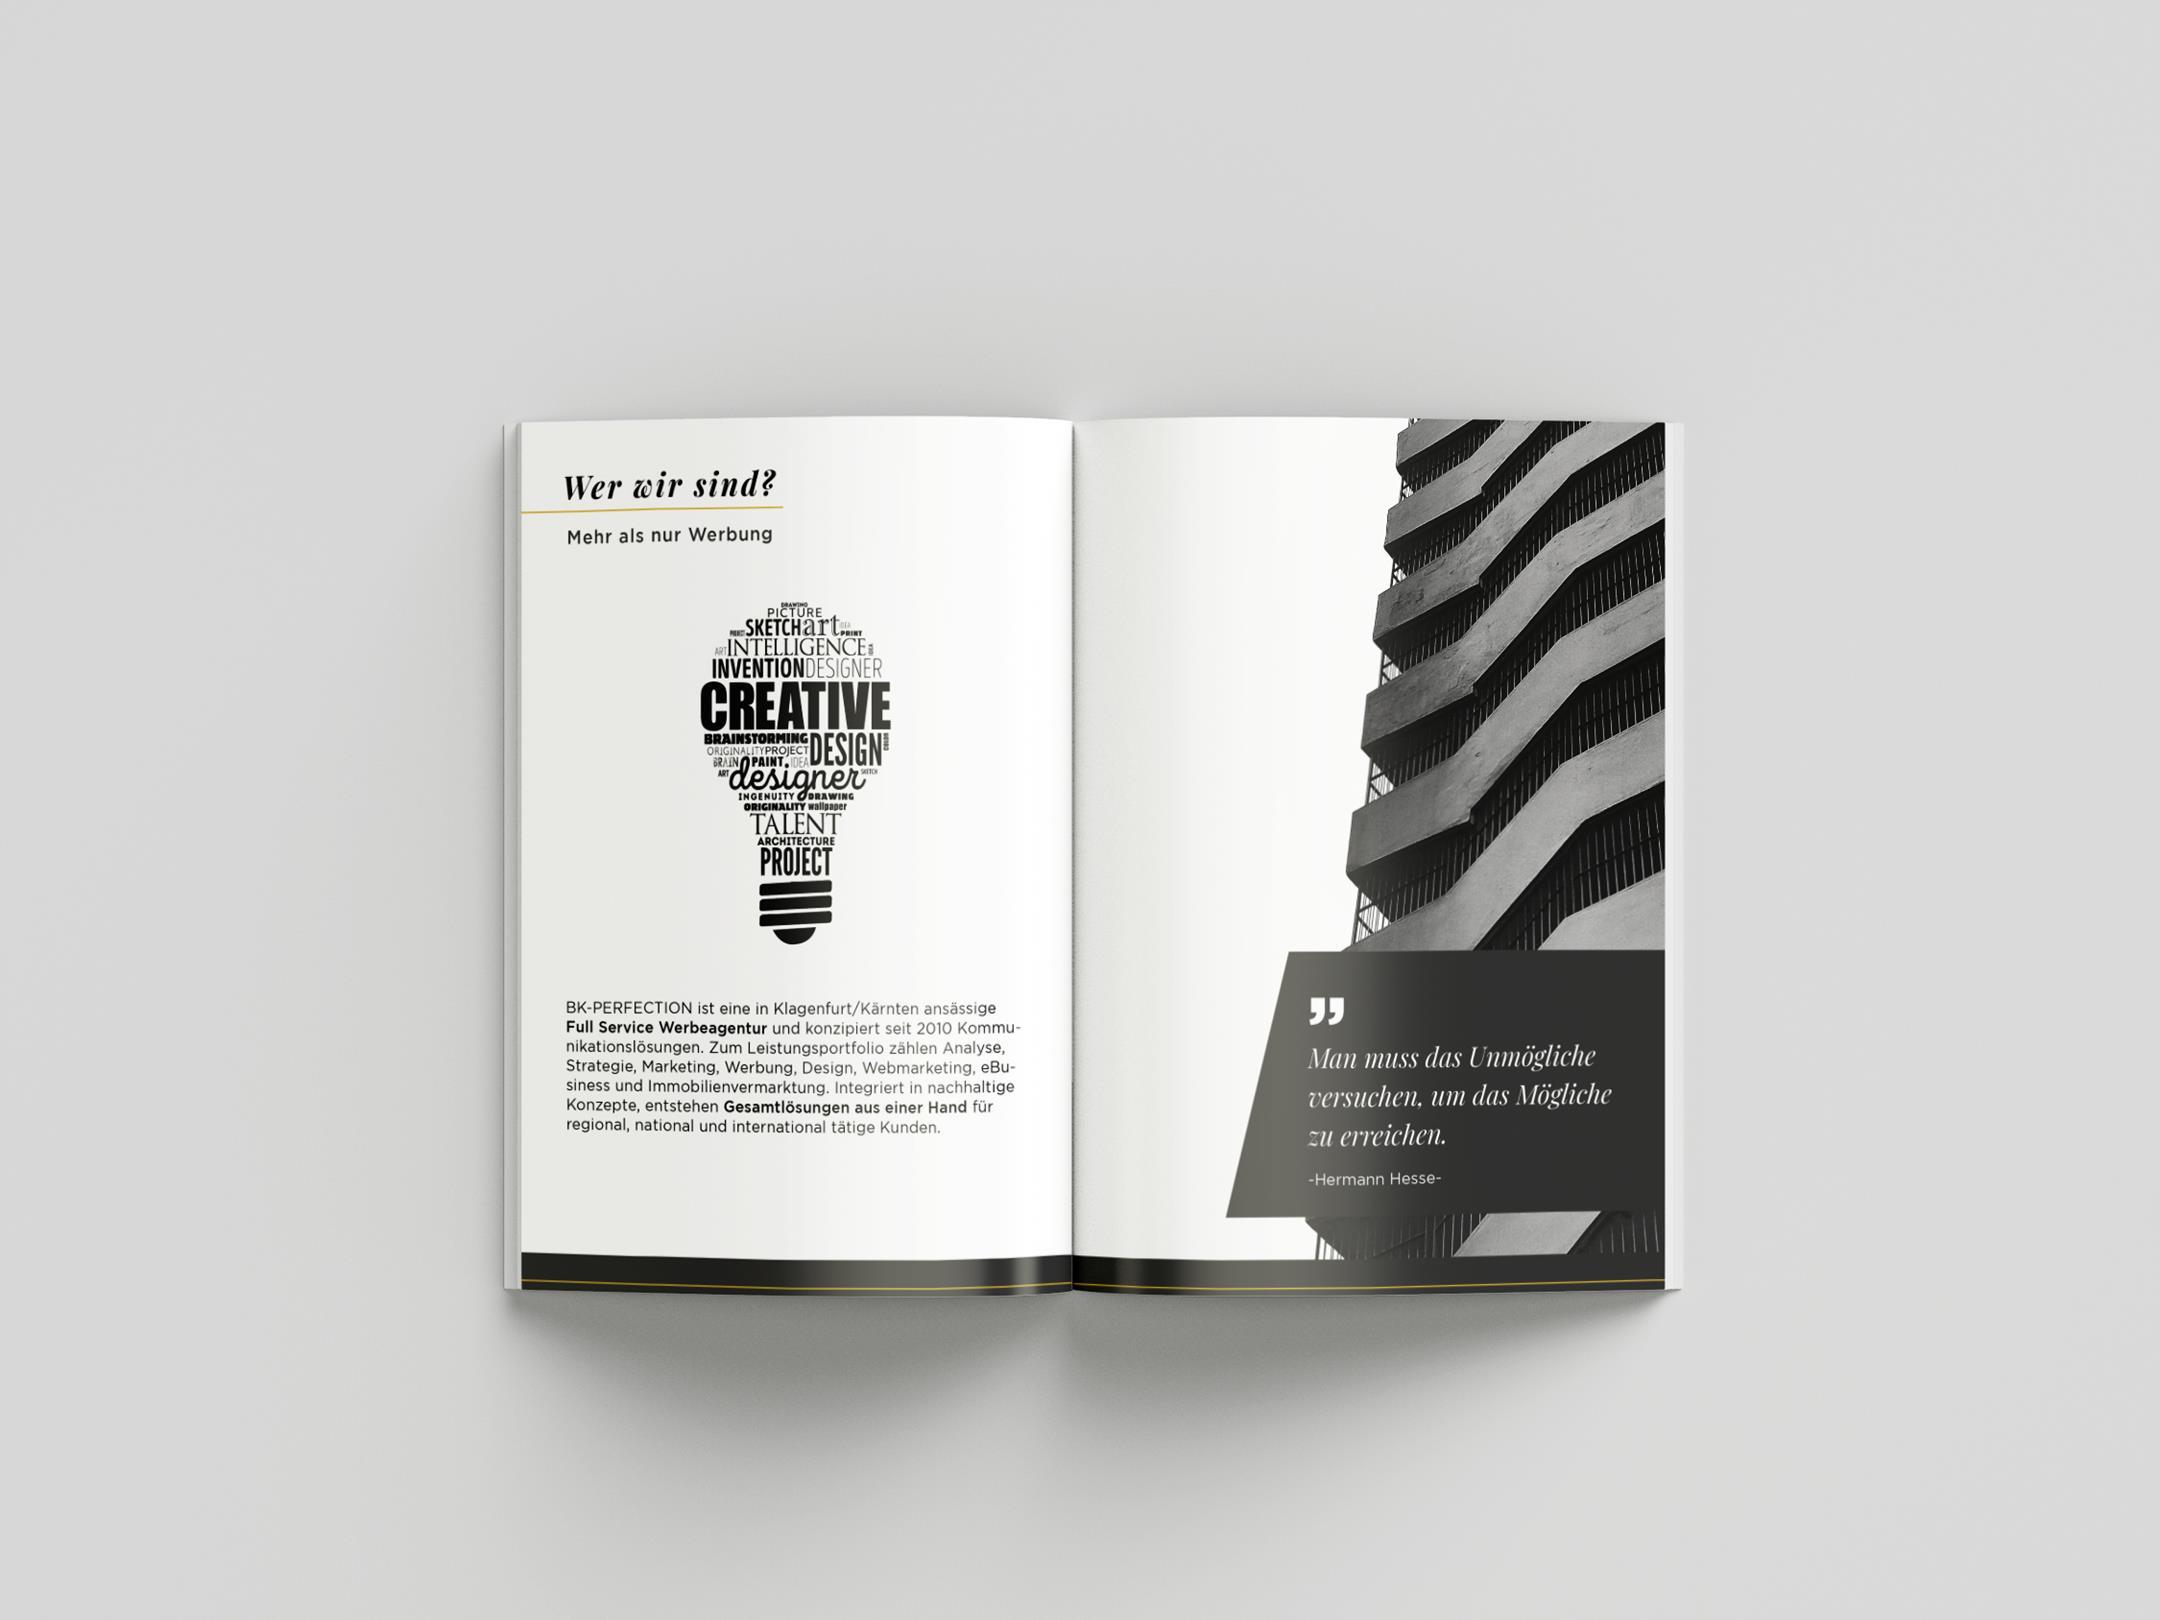 -bk-perfection-broschüre-mockup-22160×1620